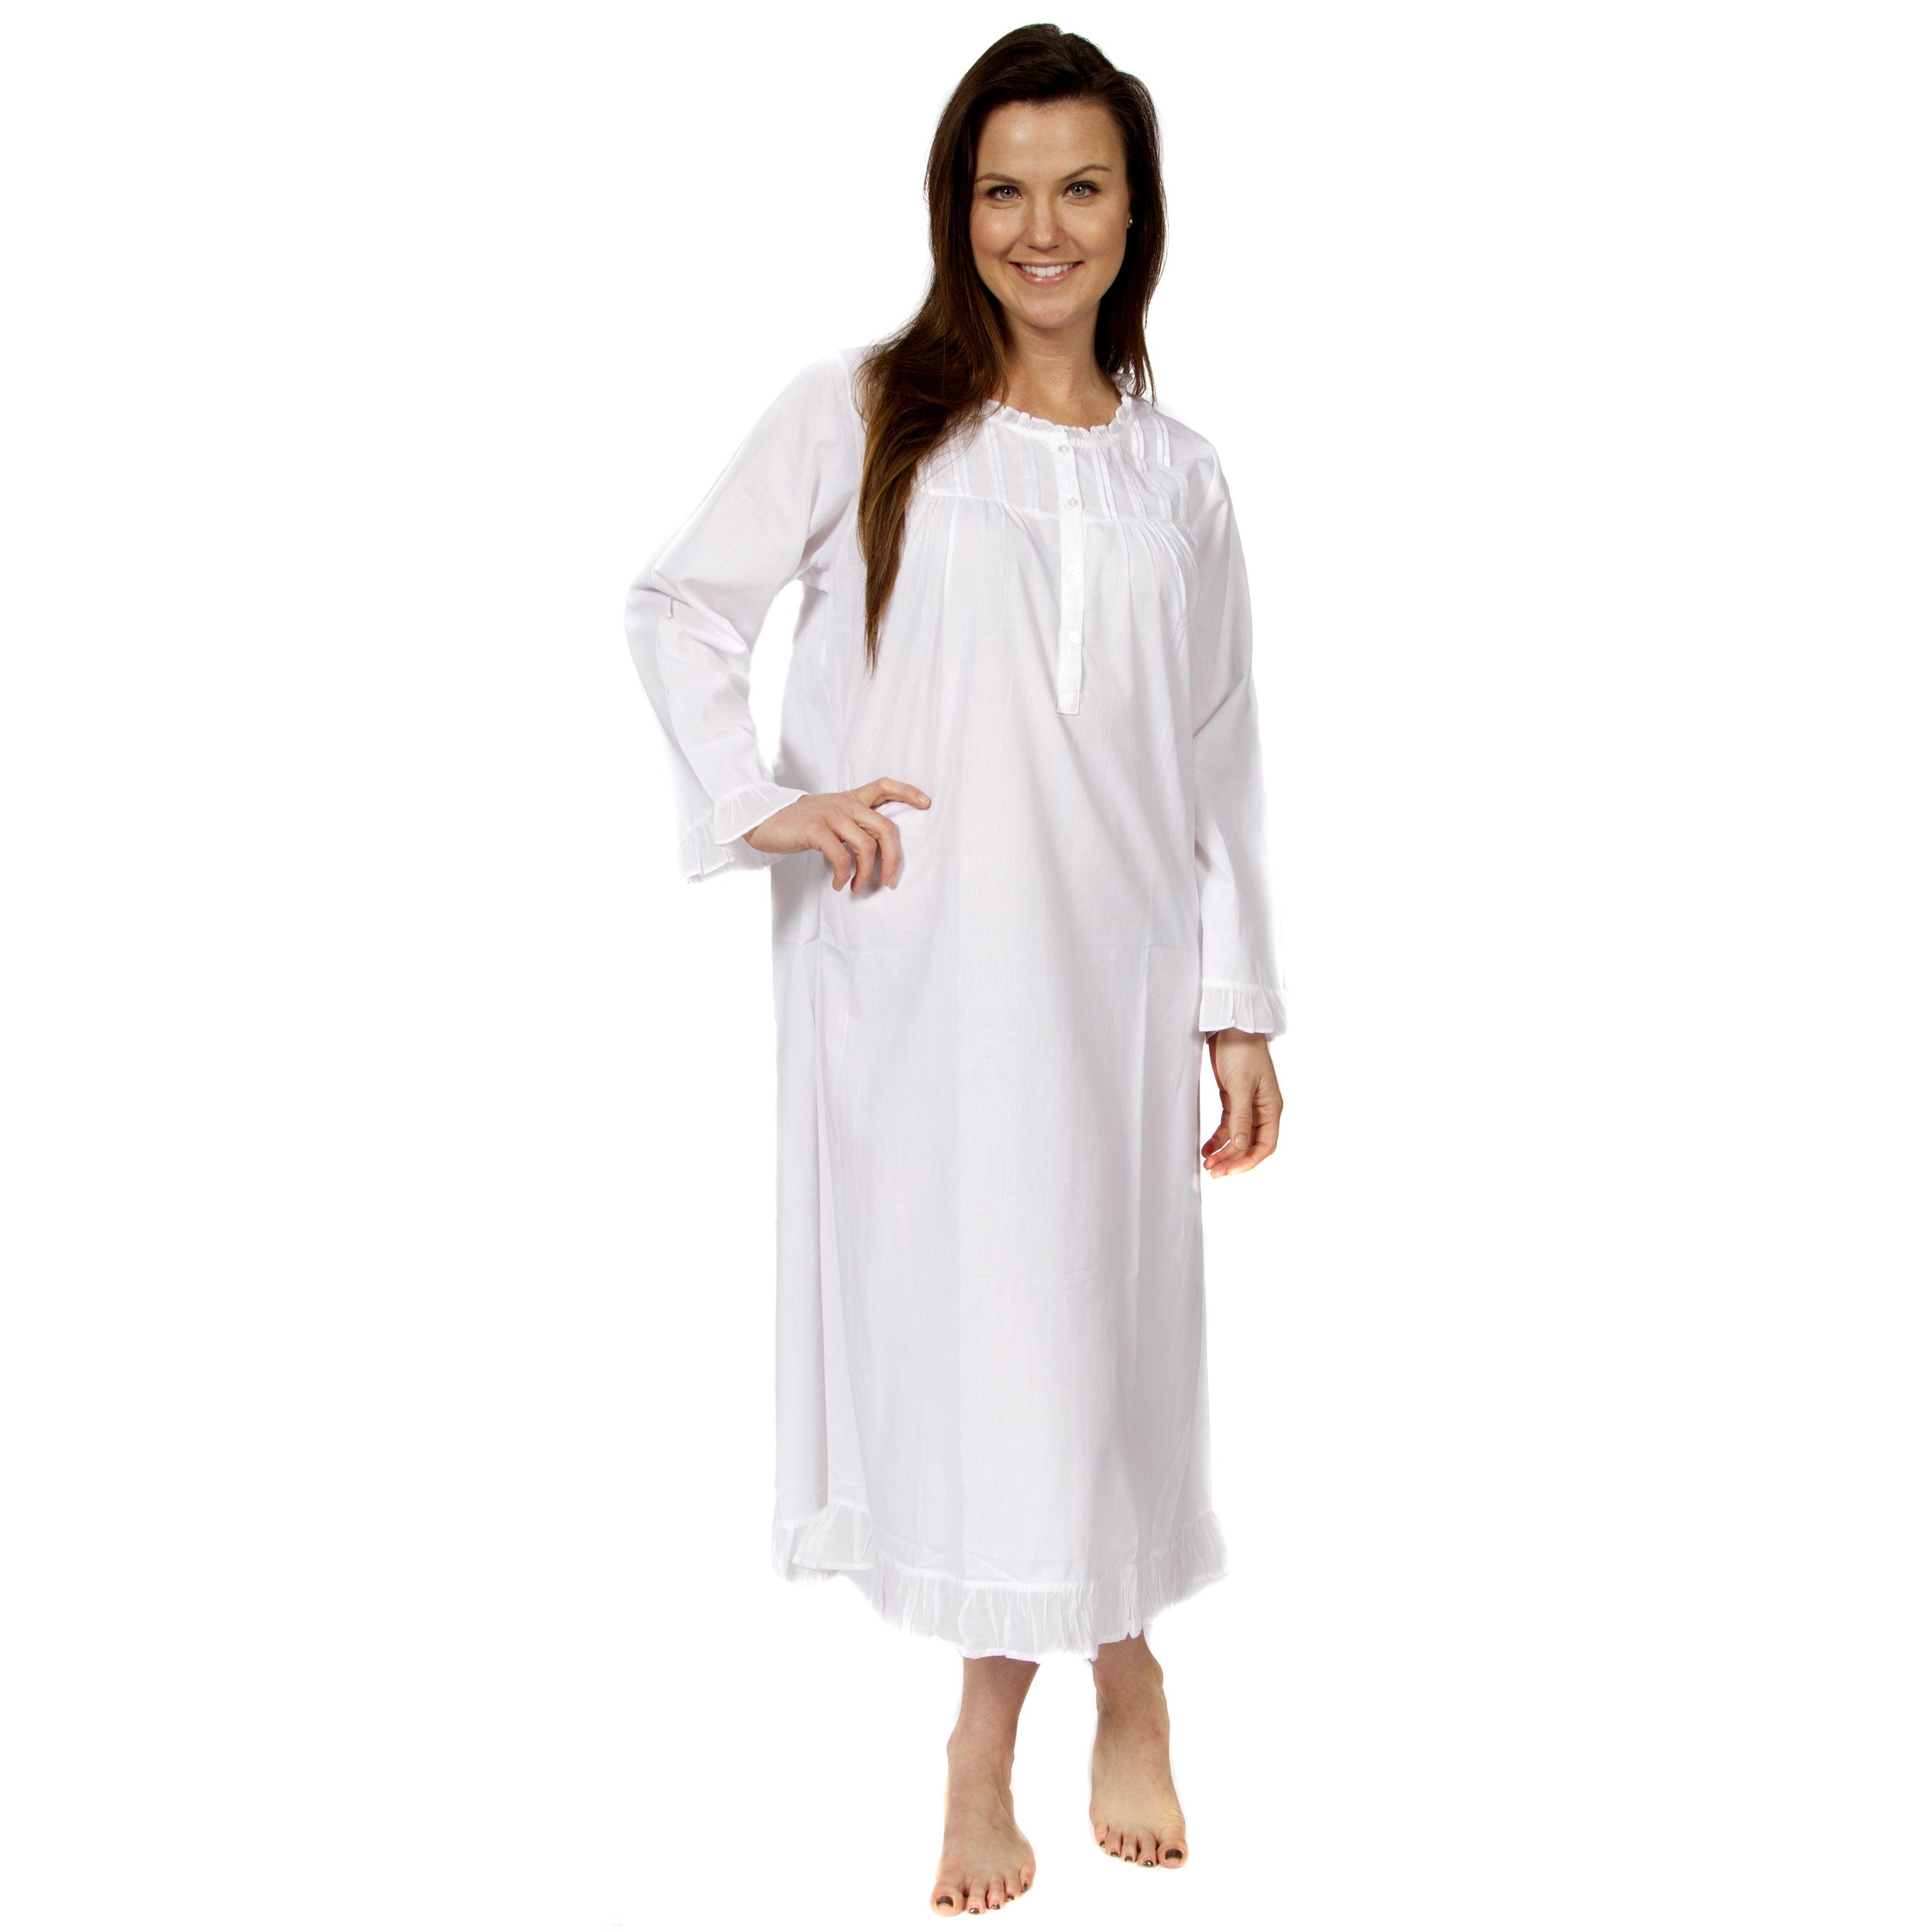 Leisureland Women's Long Sleeve Victorian Nightgown (Medi...